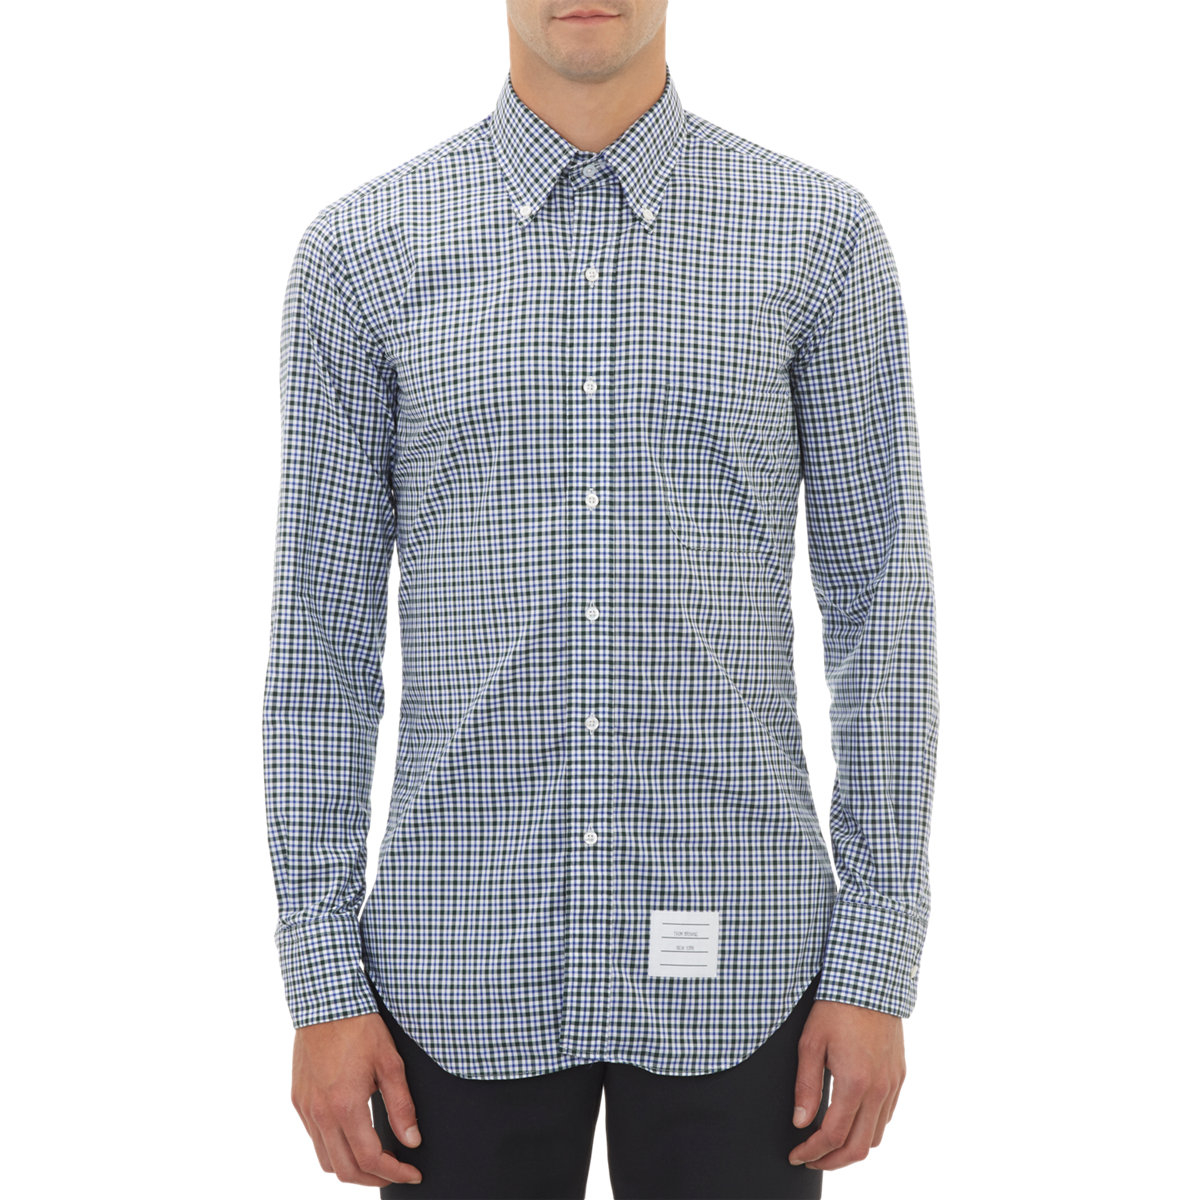 Thom browne checkpattern broadcloth shirt in white for men for Thom browne white shirt